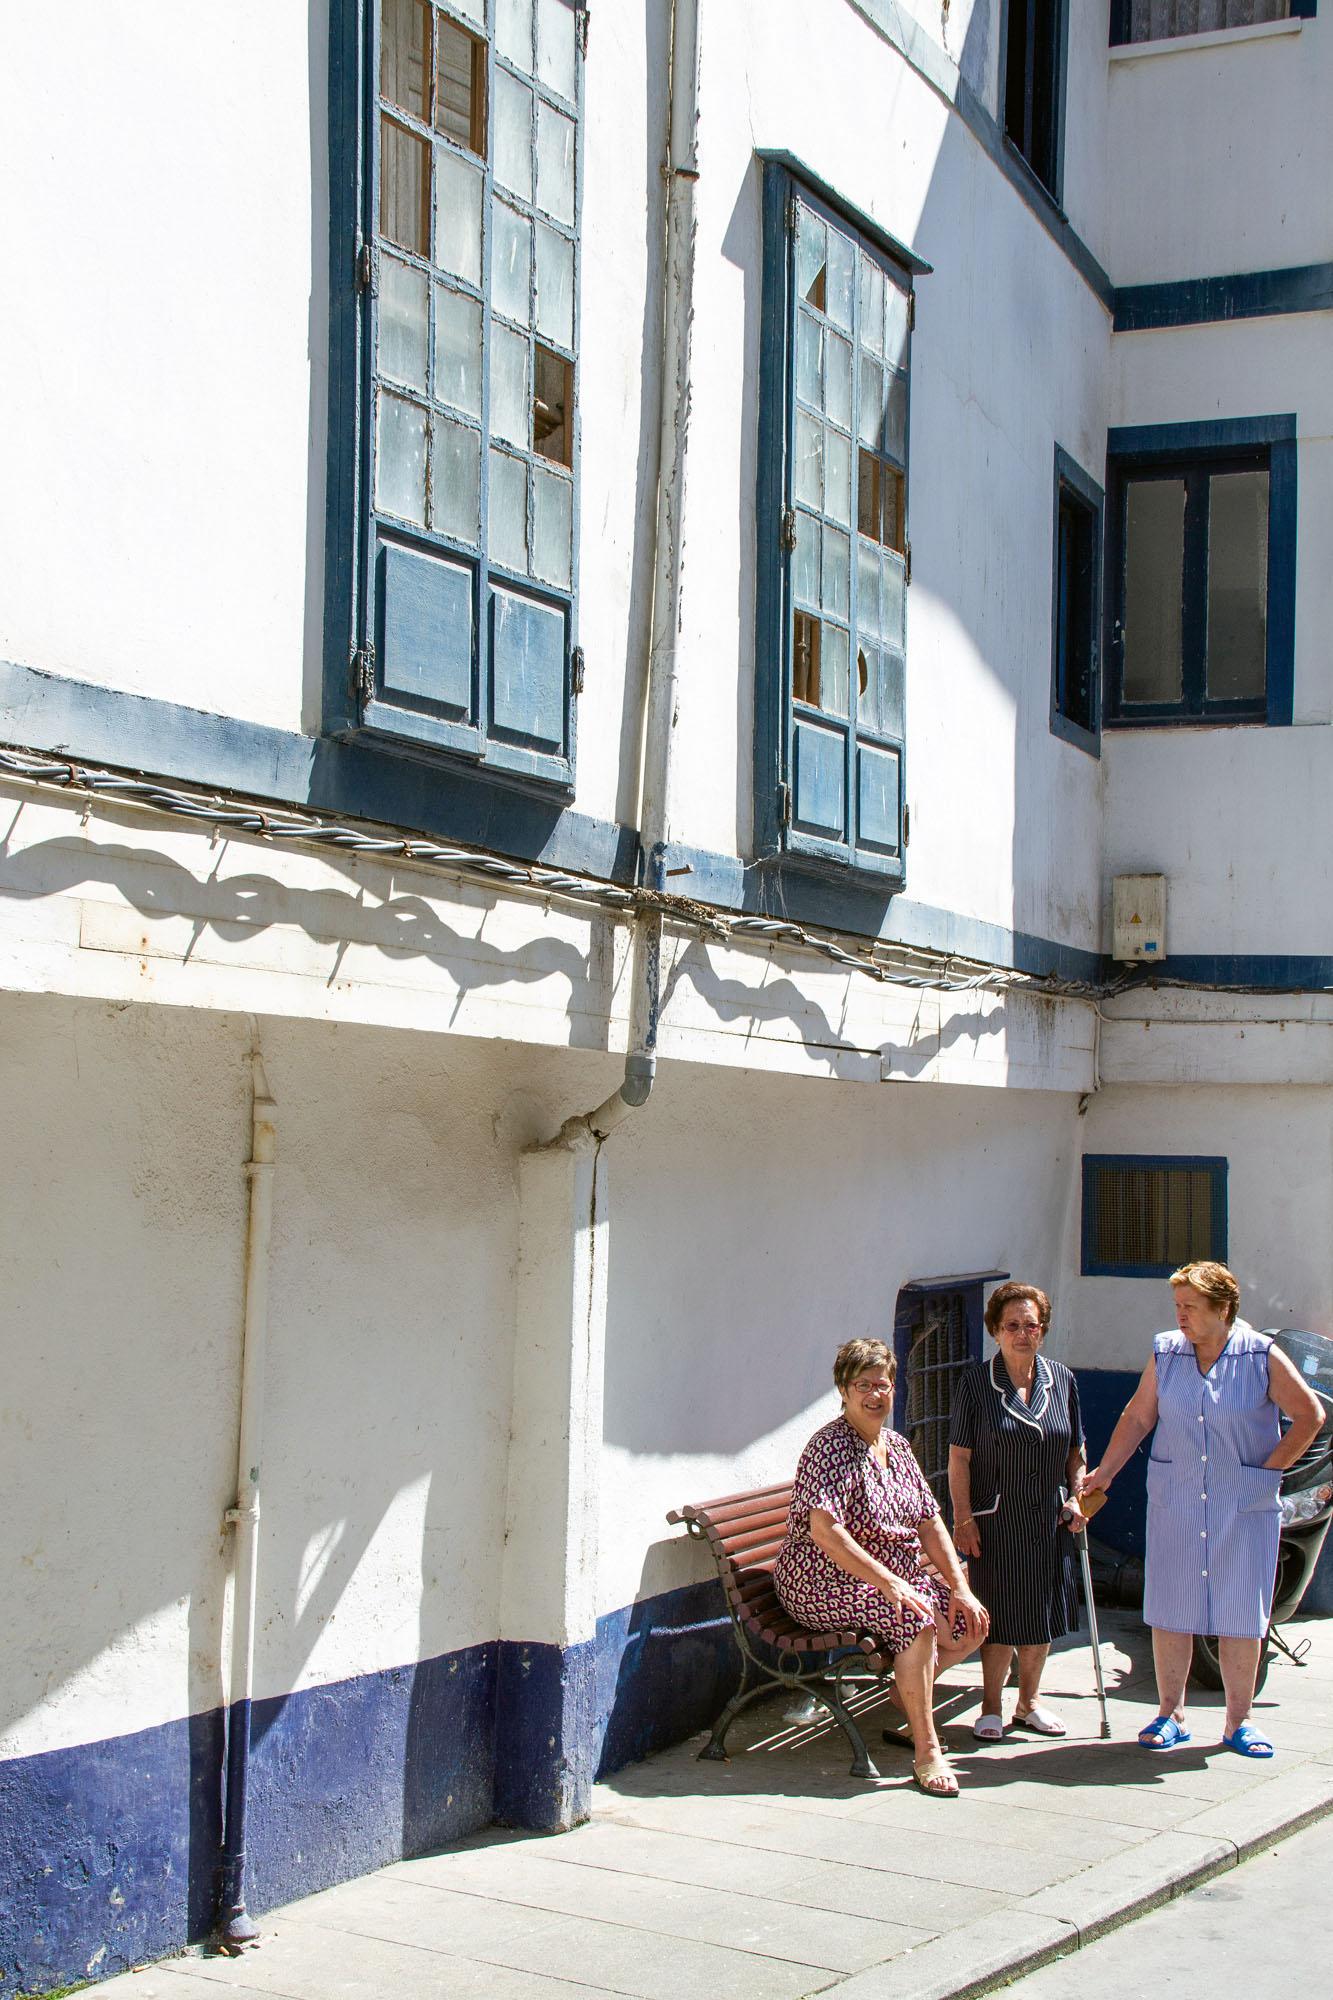 Three women in Cudillero Asturias